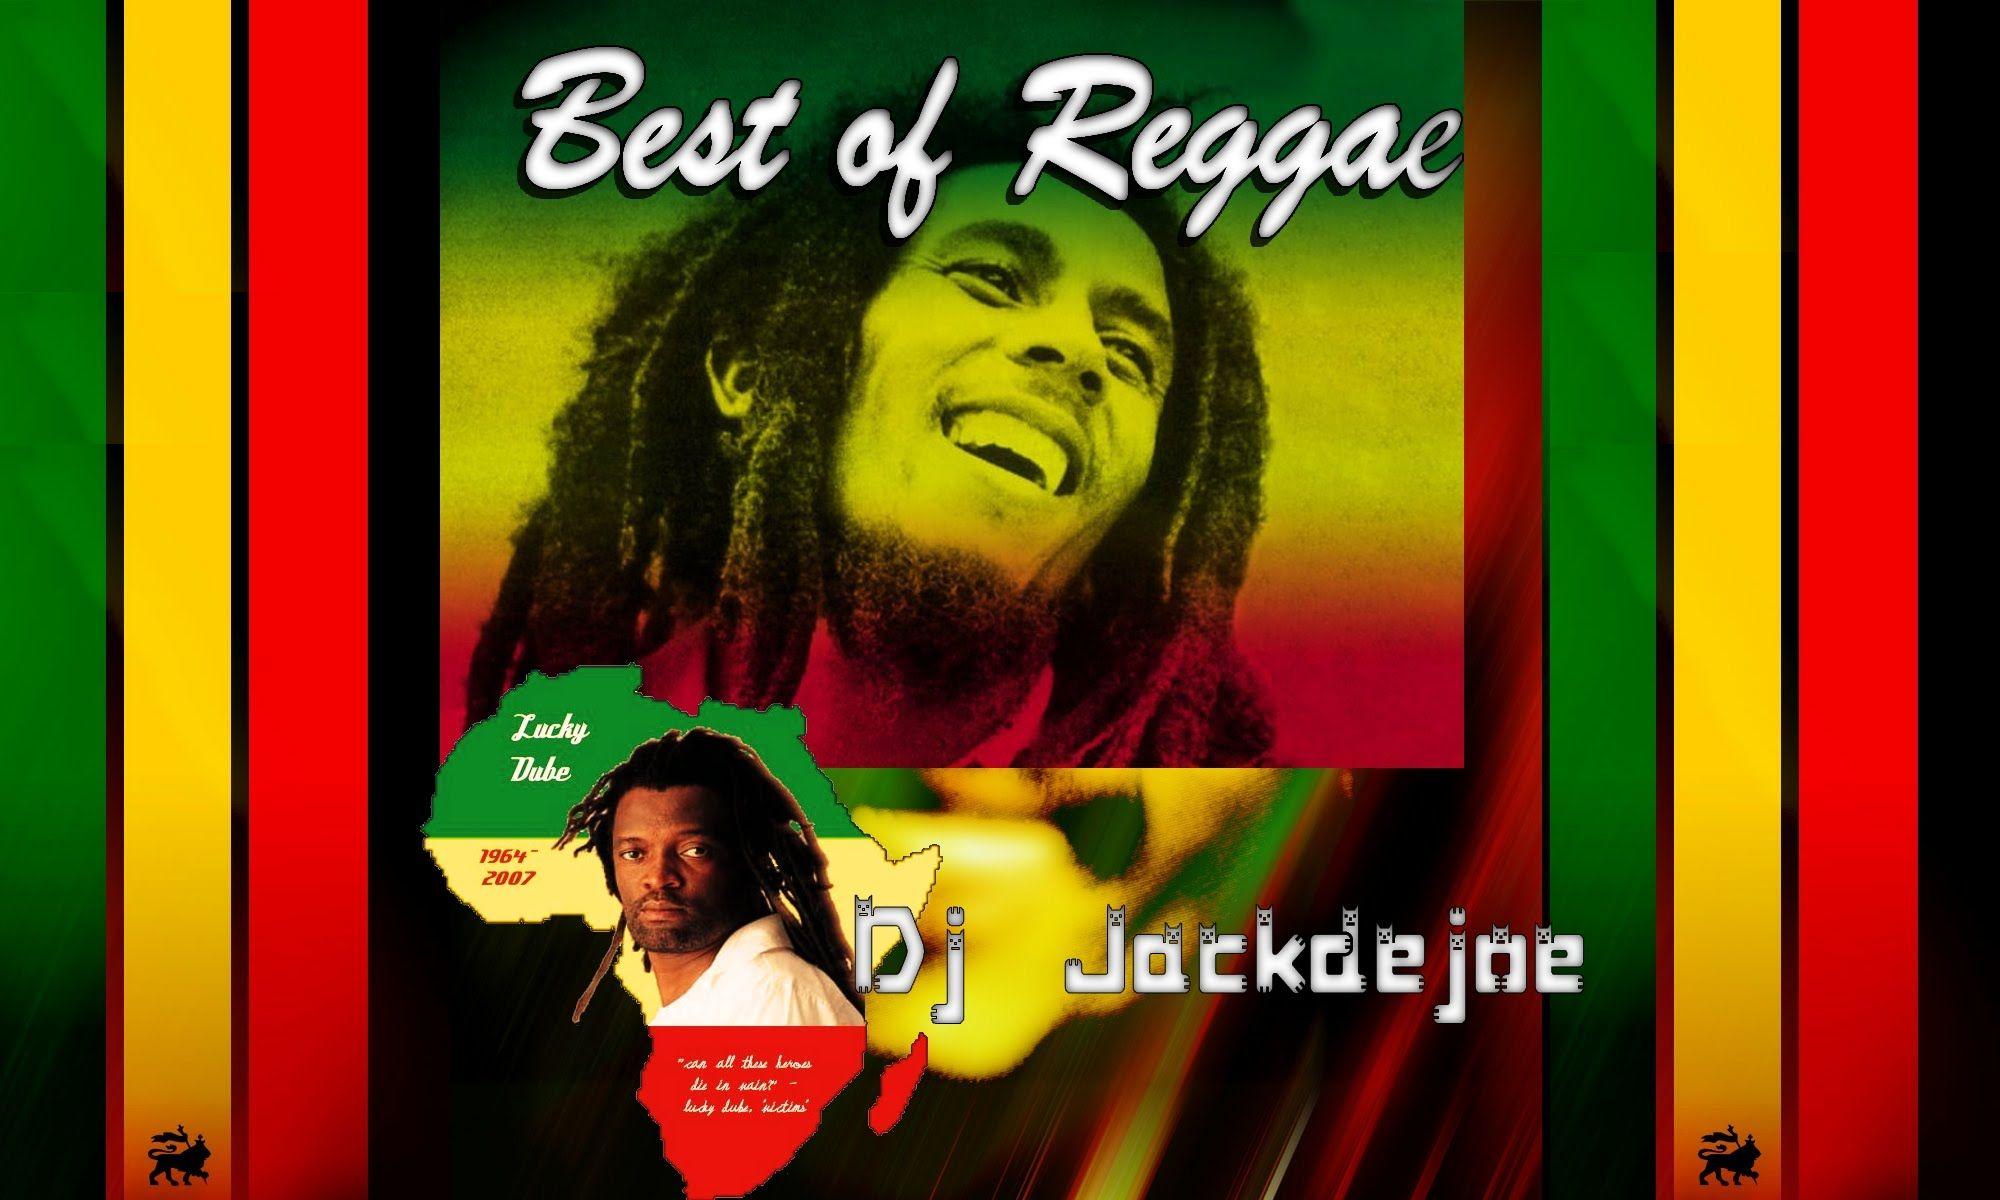 Reggae Mix 2015 Vol 1 Ft  Bob Marley, Lucky Dube, Culture